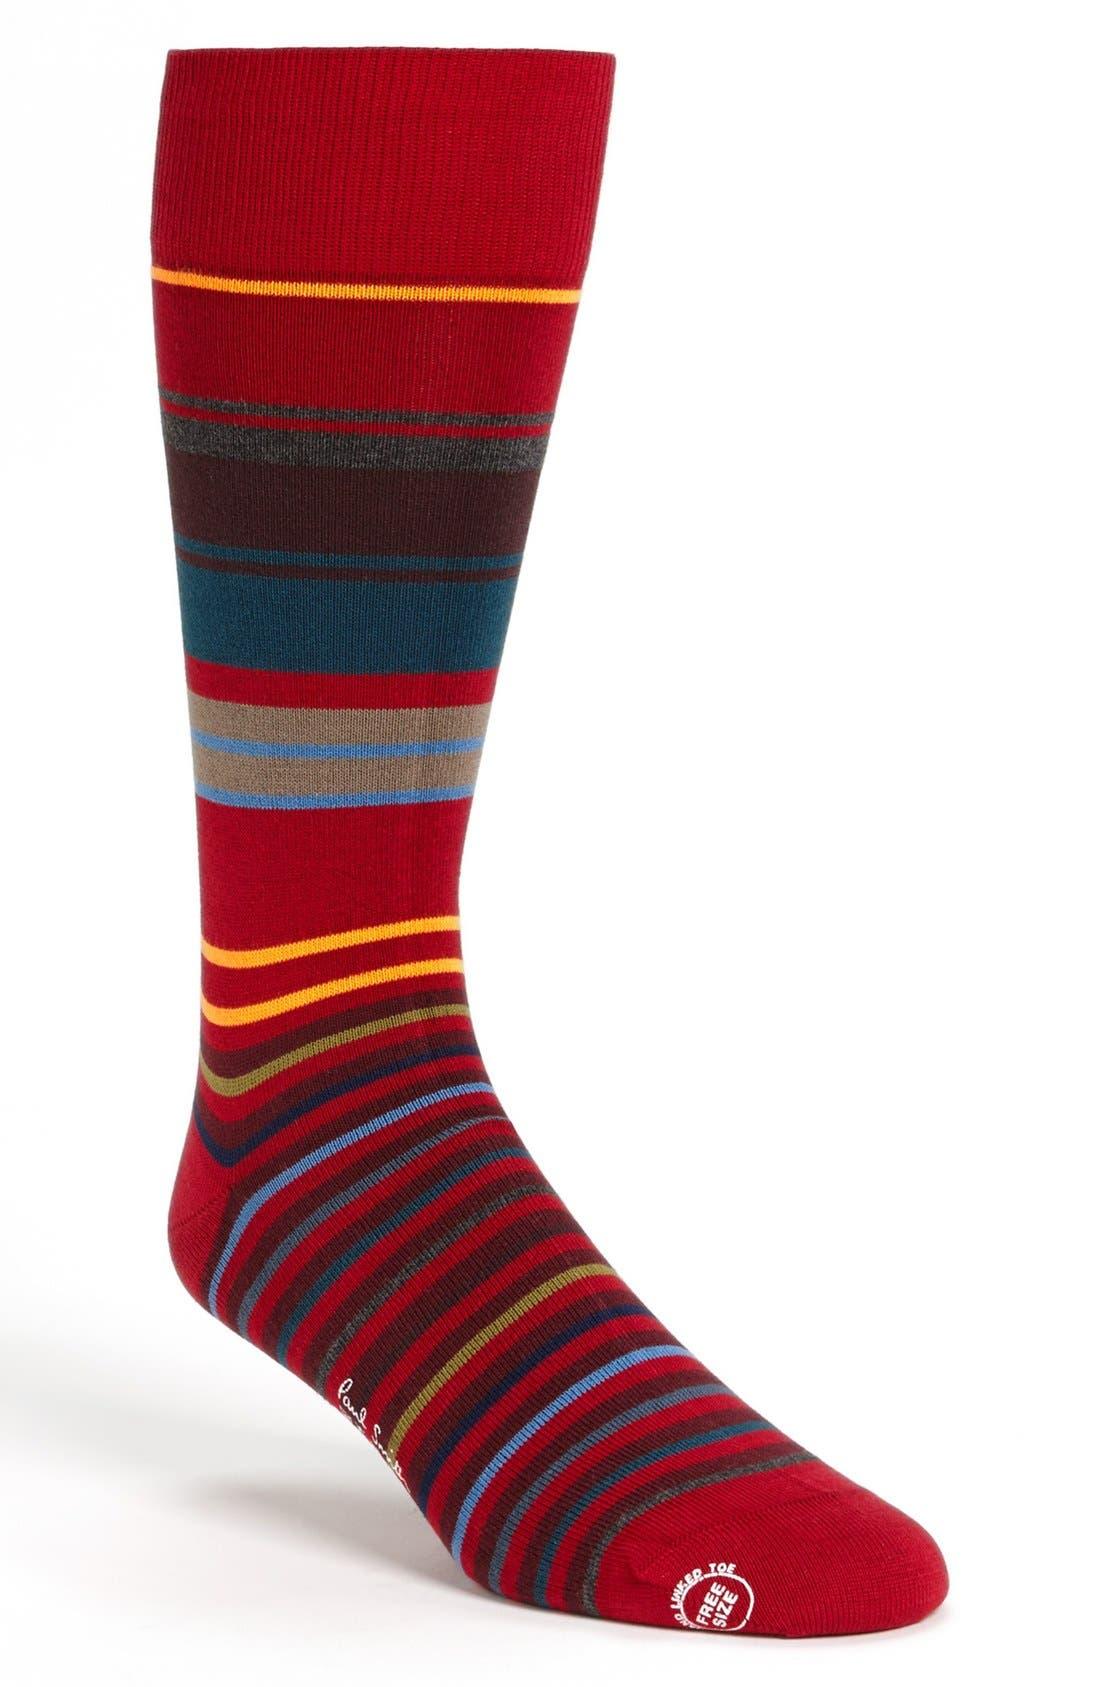 Main Image - Paul Smith Accessories Neon Stripe Socks